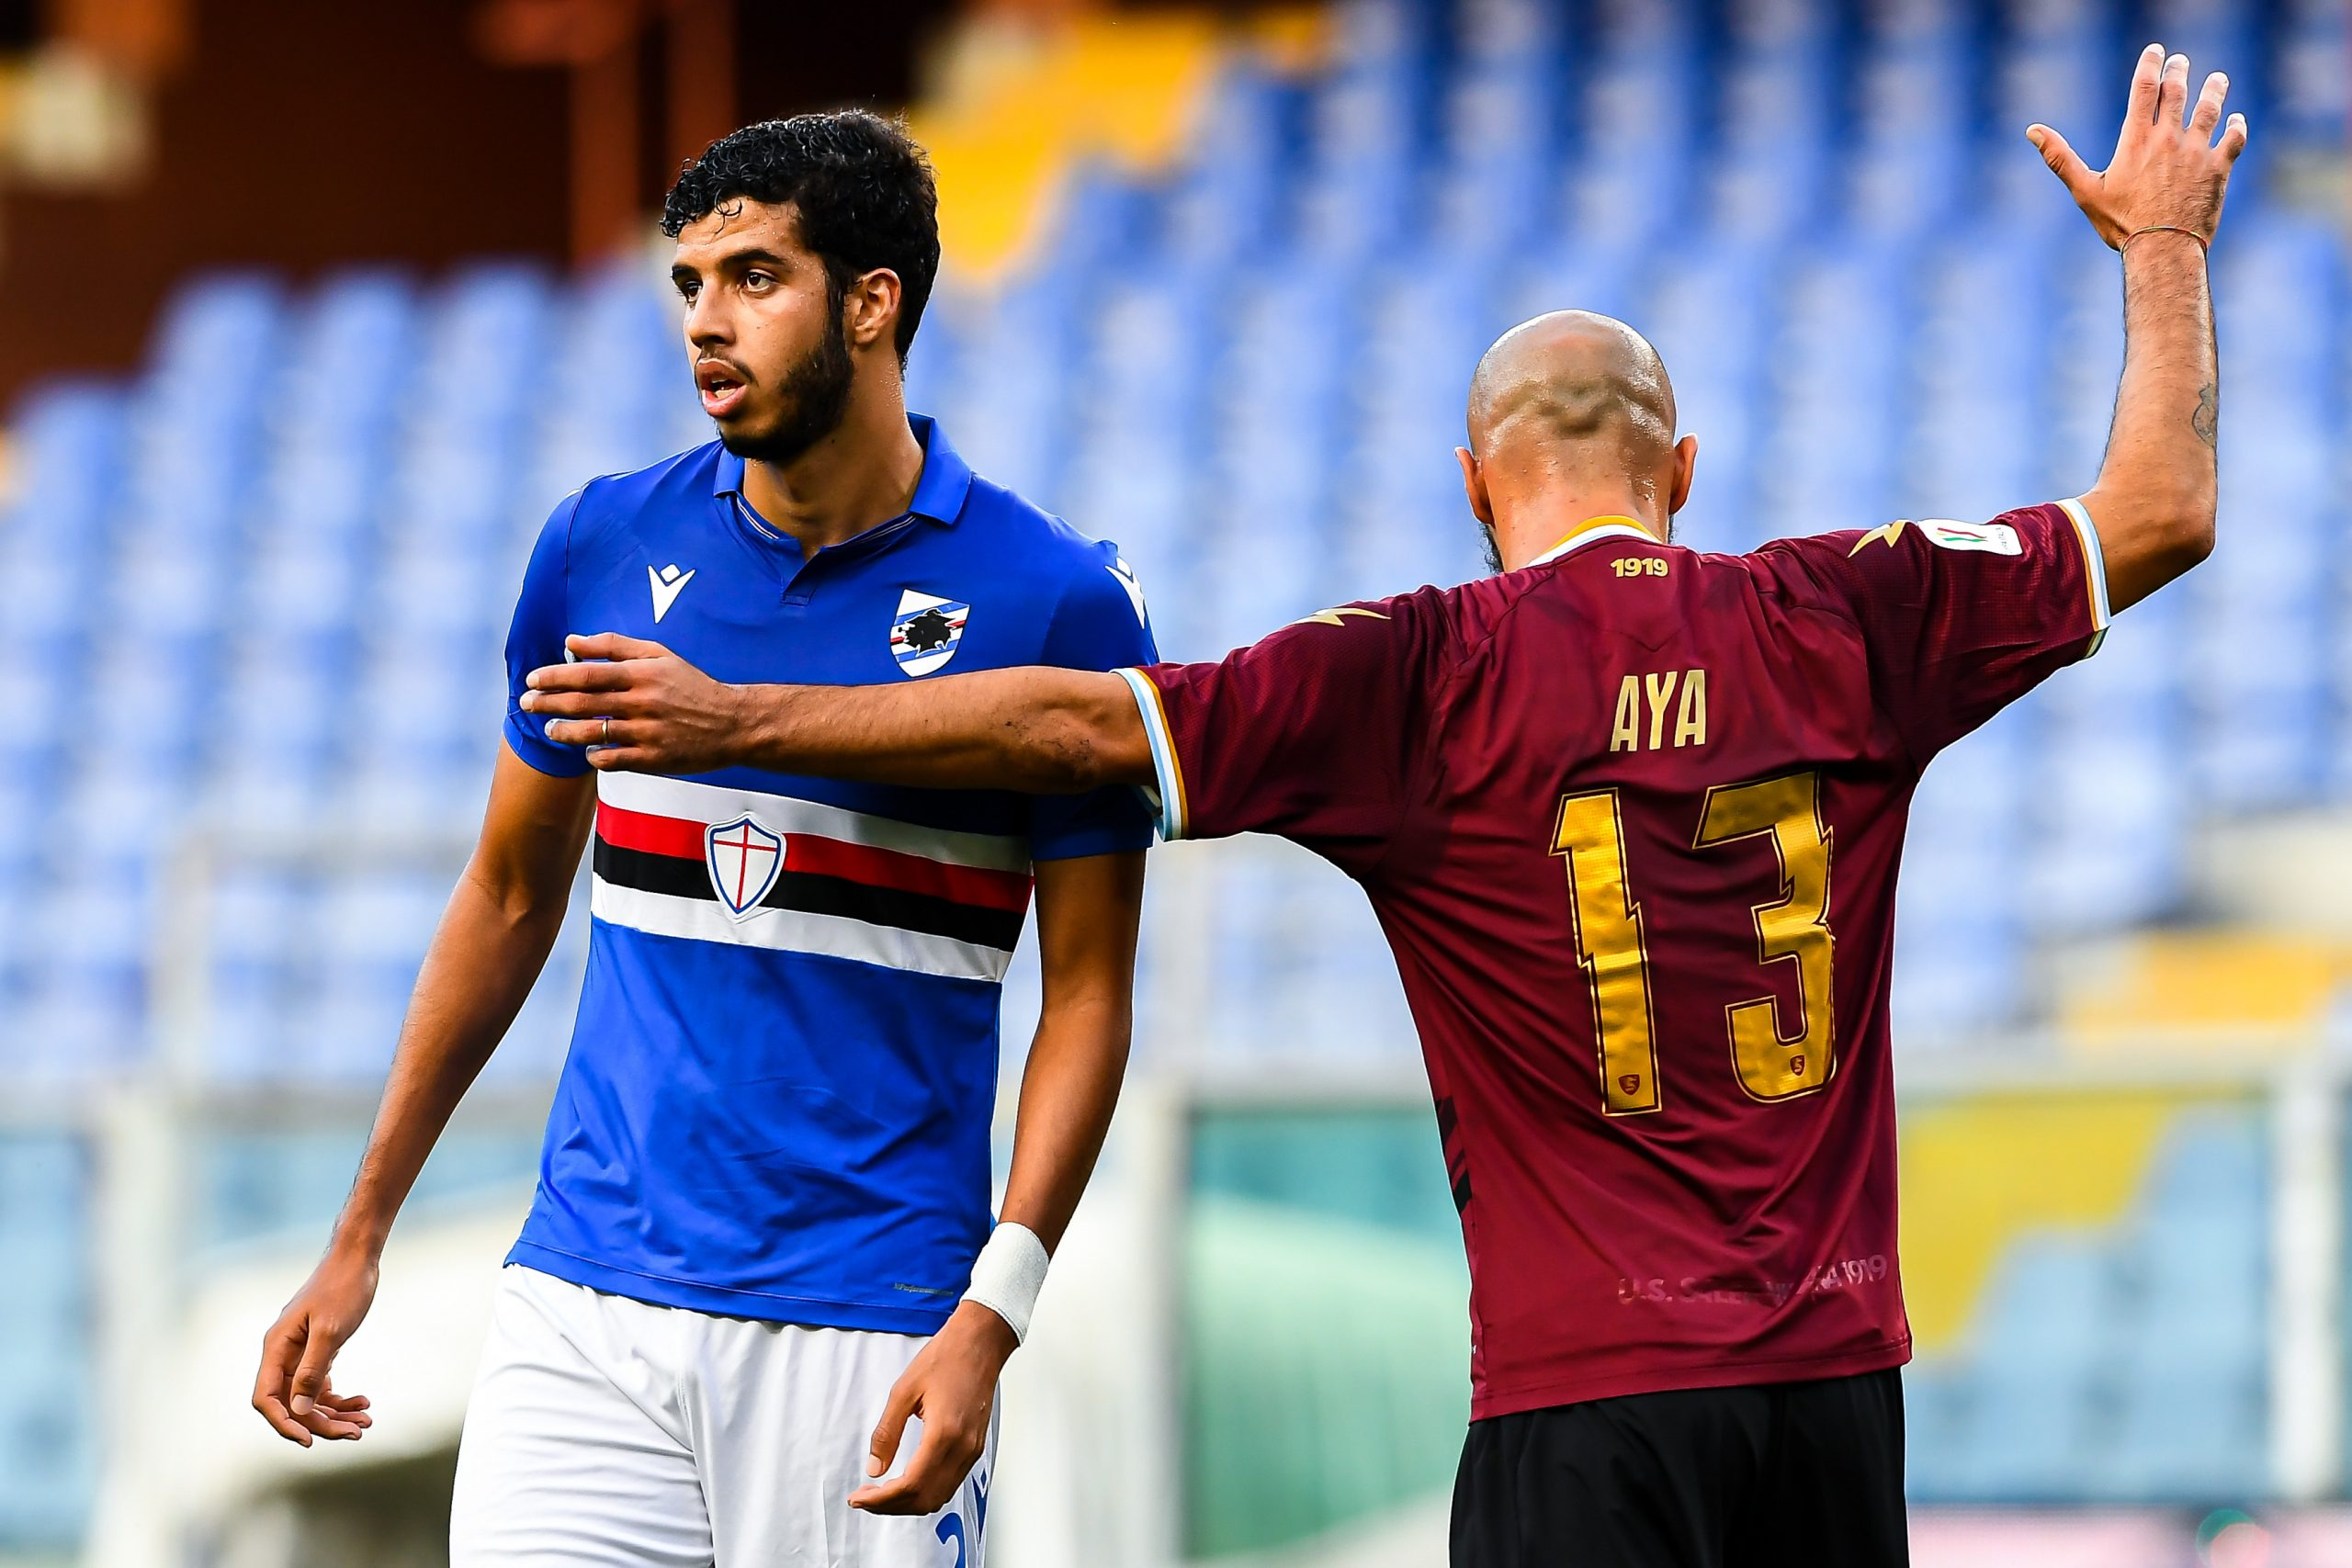 Coppa Italia 2020/21 | Sampdoria-Salernitana - U.C. Sampdoria